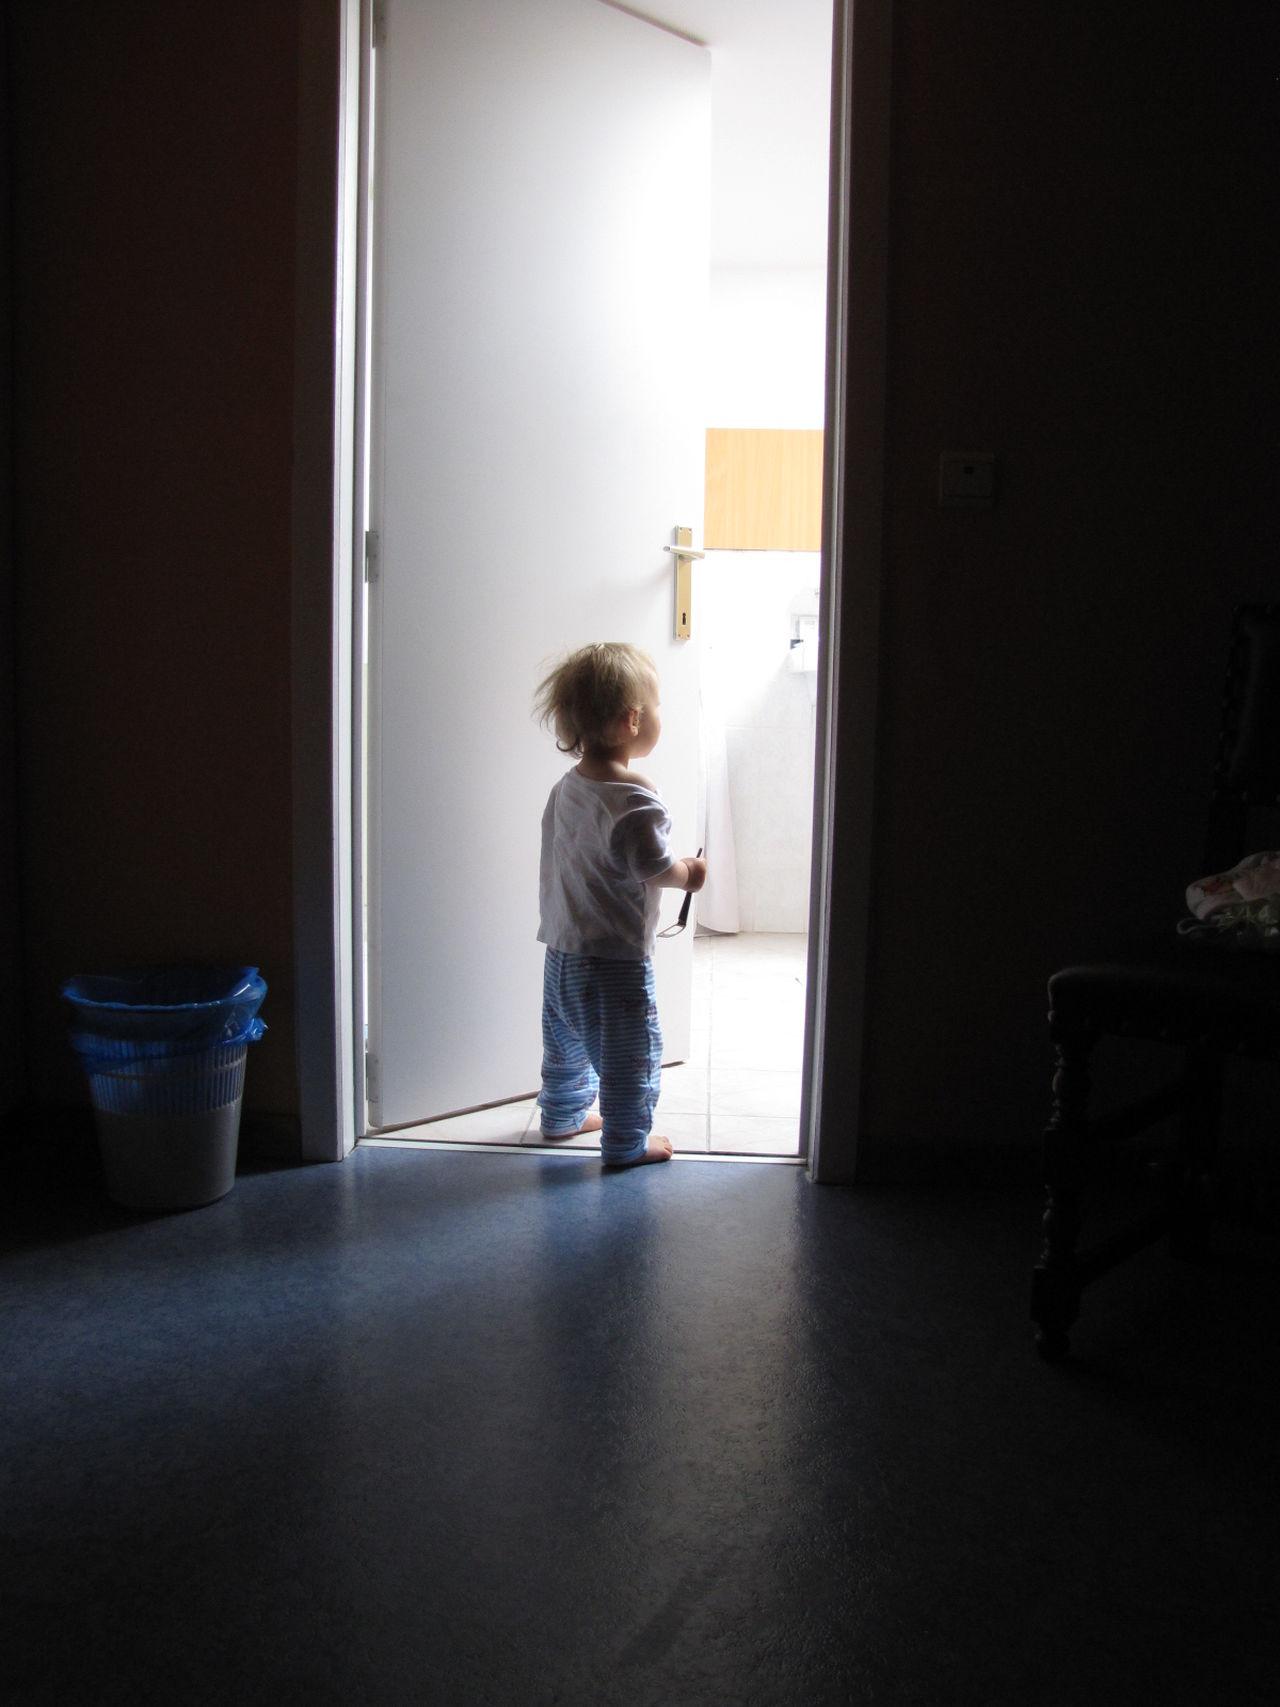 childhood, child, full length, indoors, standing